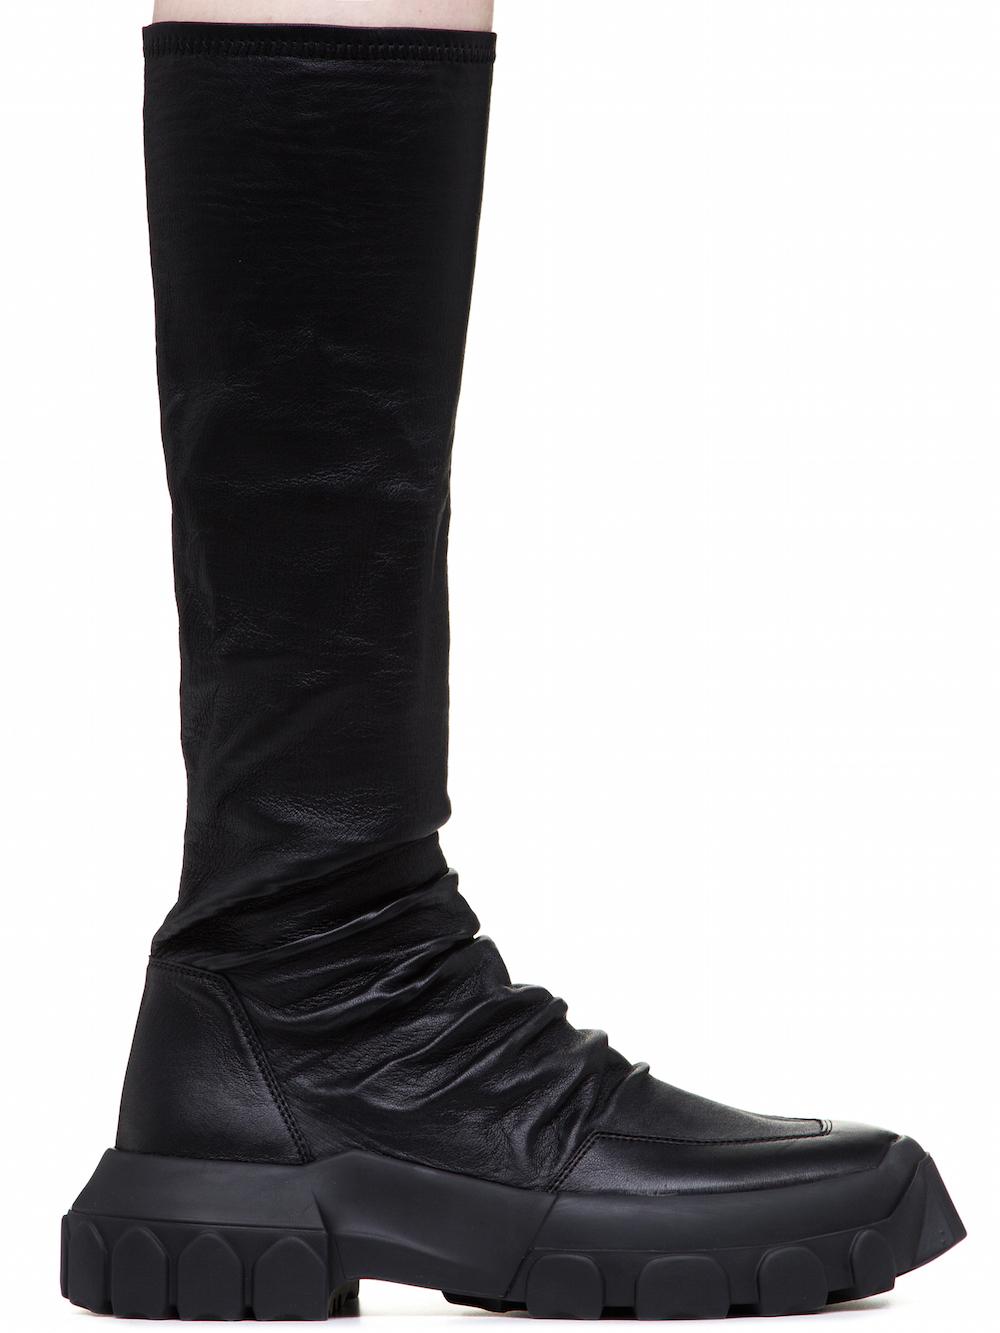 stretch hiking sock sneakers - Black Rick Owens k5B4d